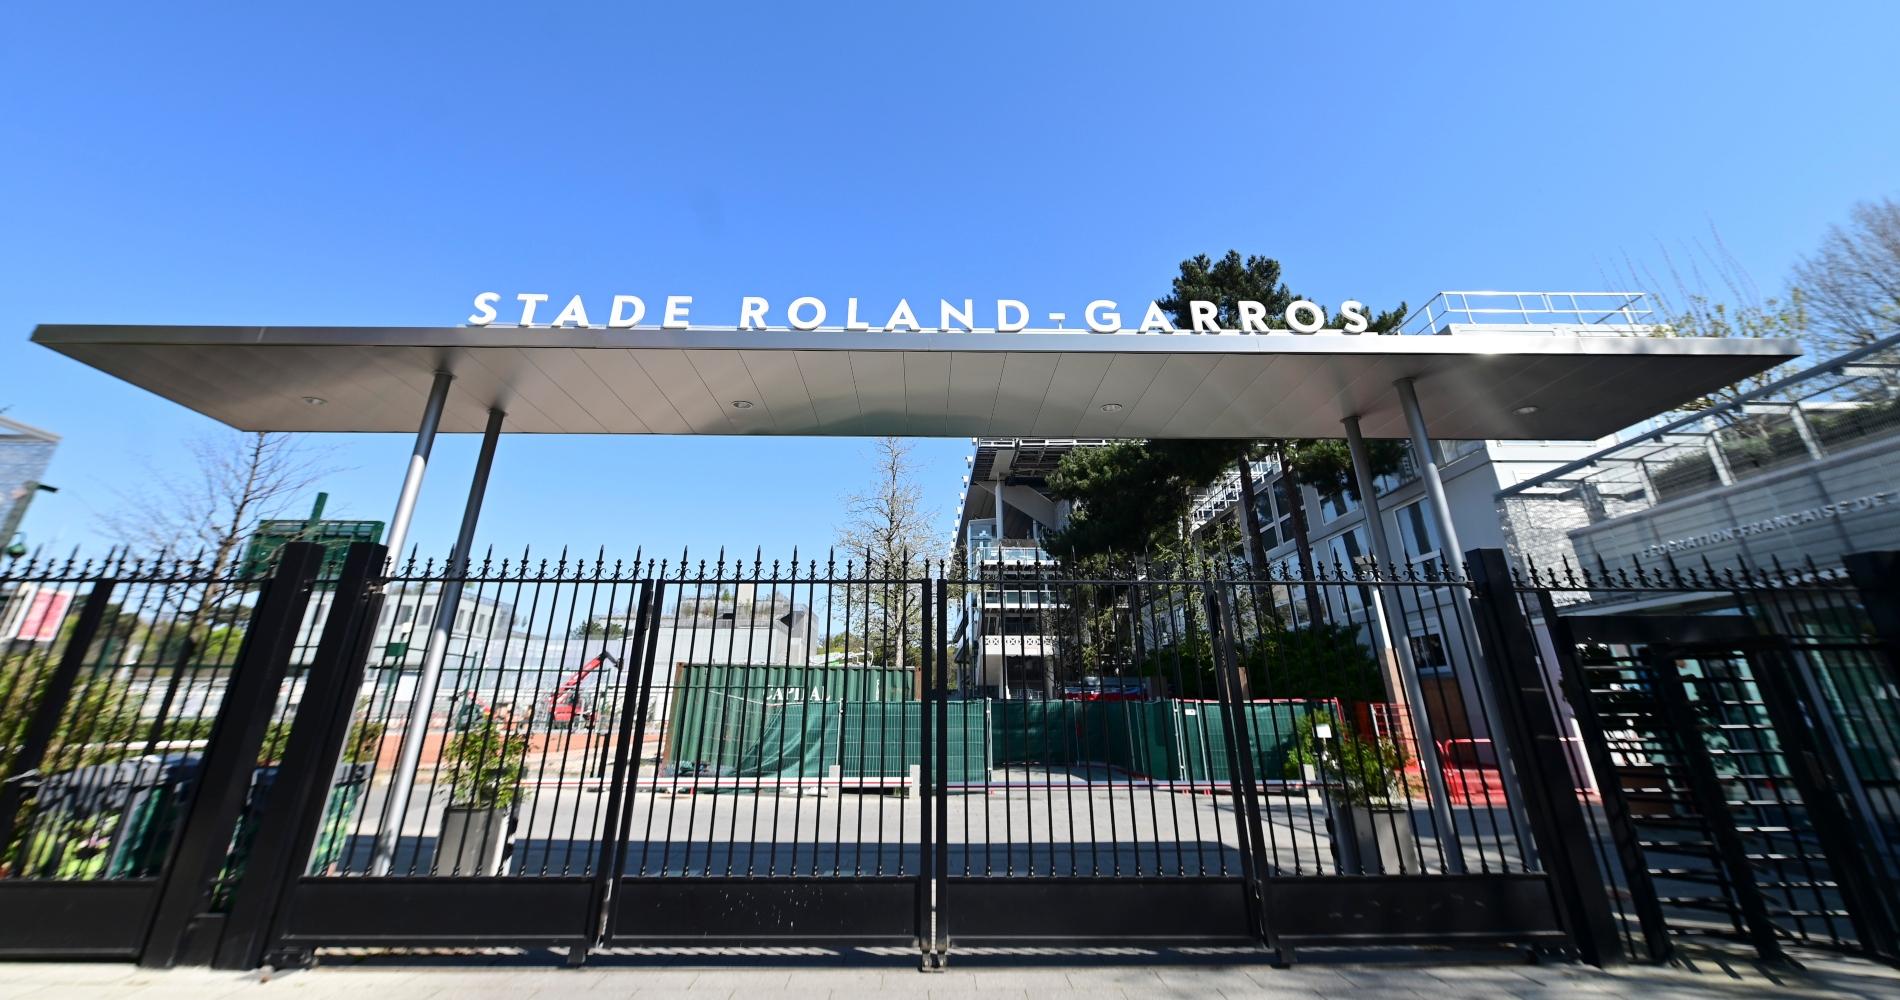 Roland-Garros' entry